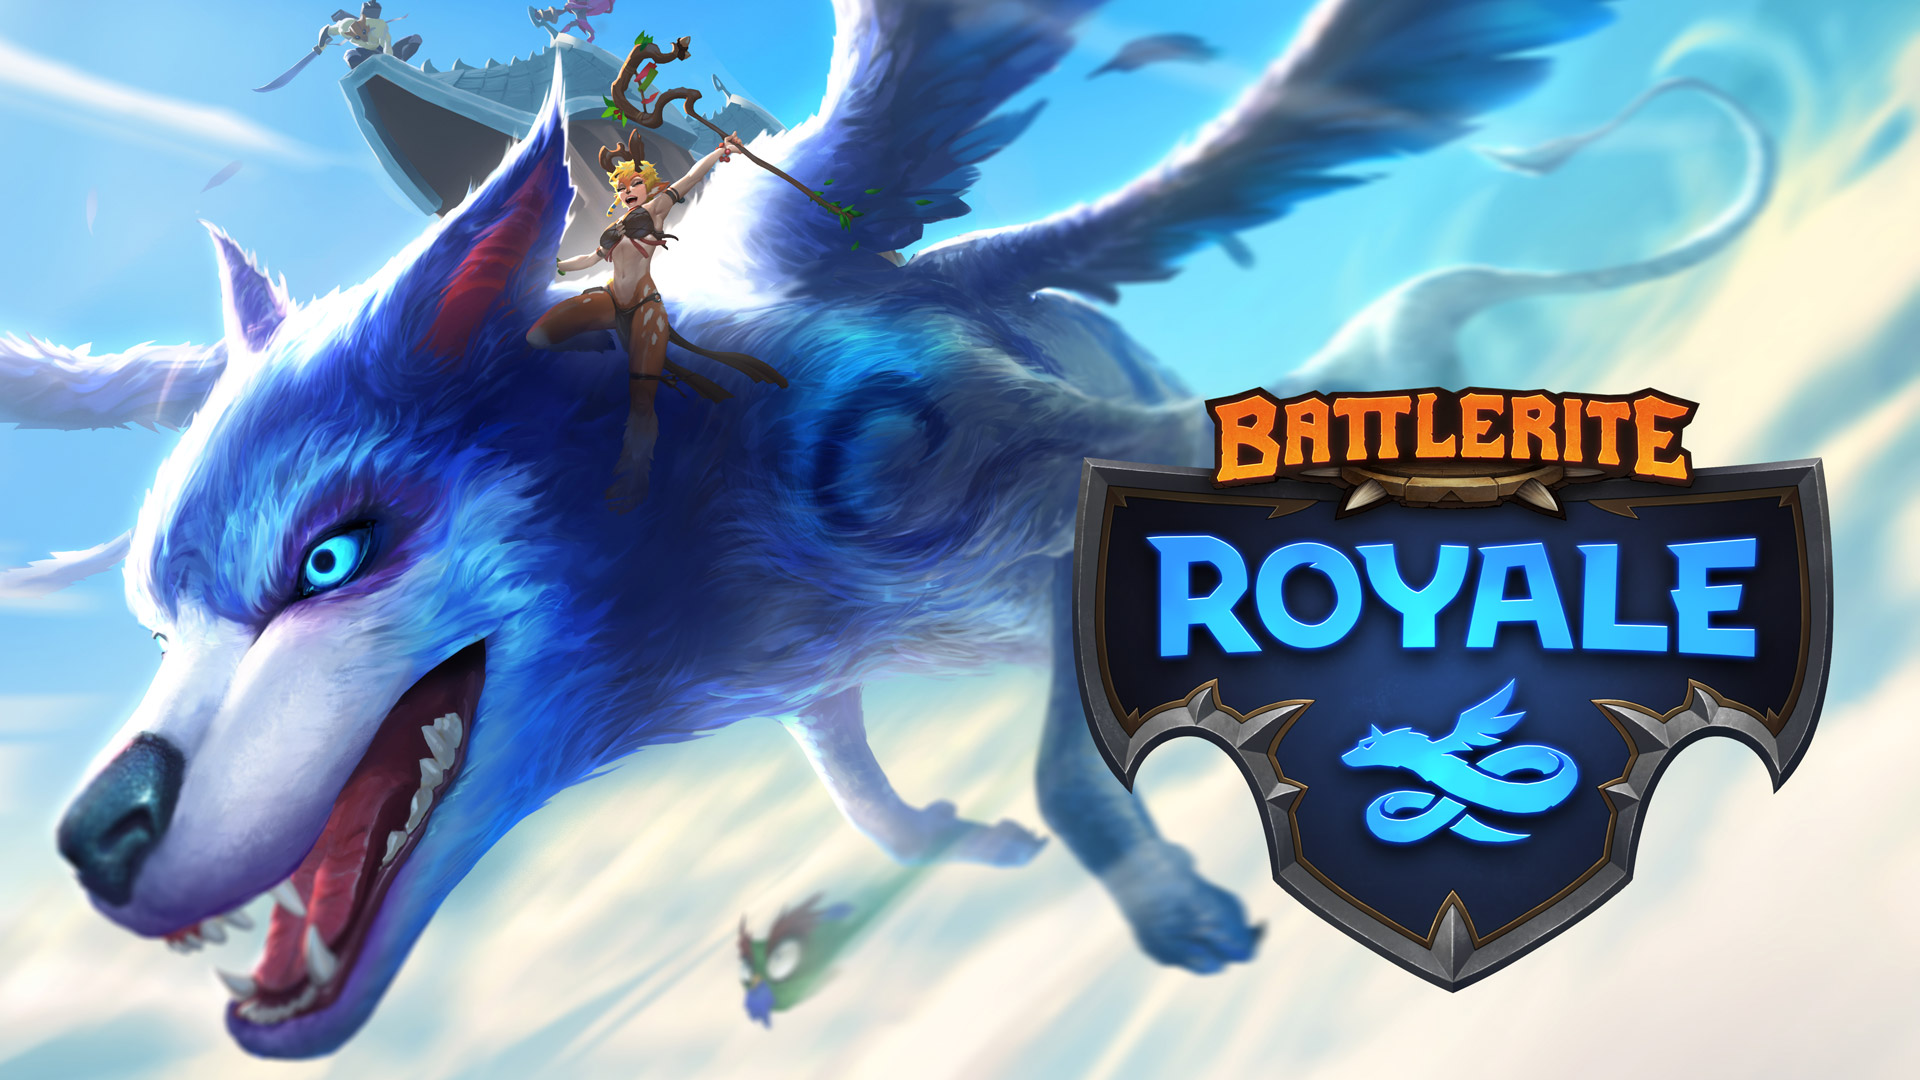 battlerite royale sortie